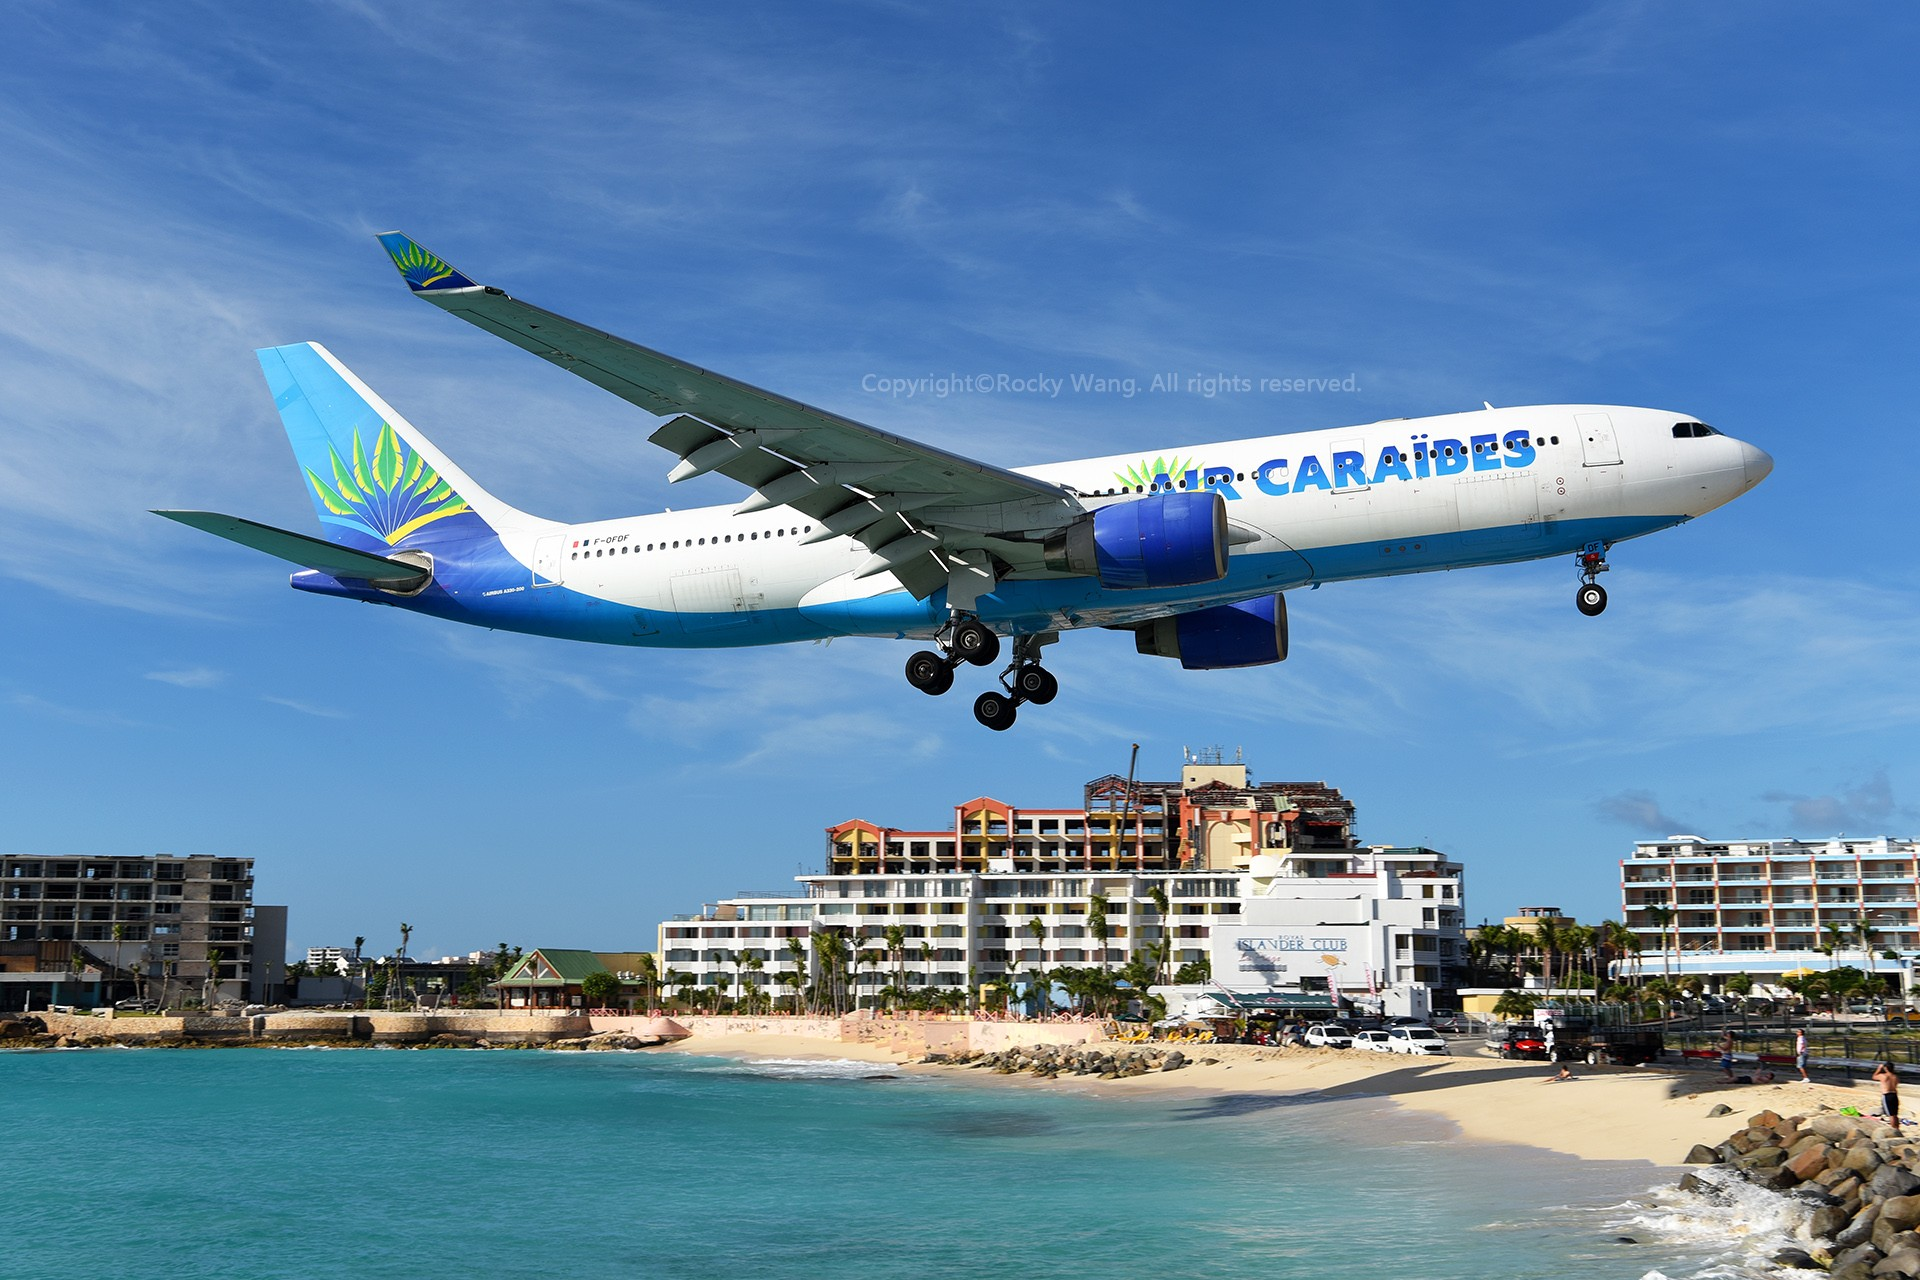 Re:[原创]My endless Caribbean dream——圣马丁朱莉安娜公主机场拍机记 AIRBUS A330-223 F-OFDF 荷属安的列斯群岛朱利安娜公主机场